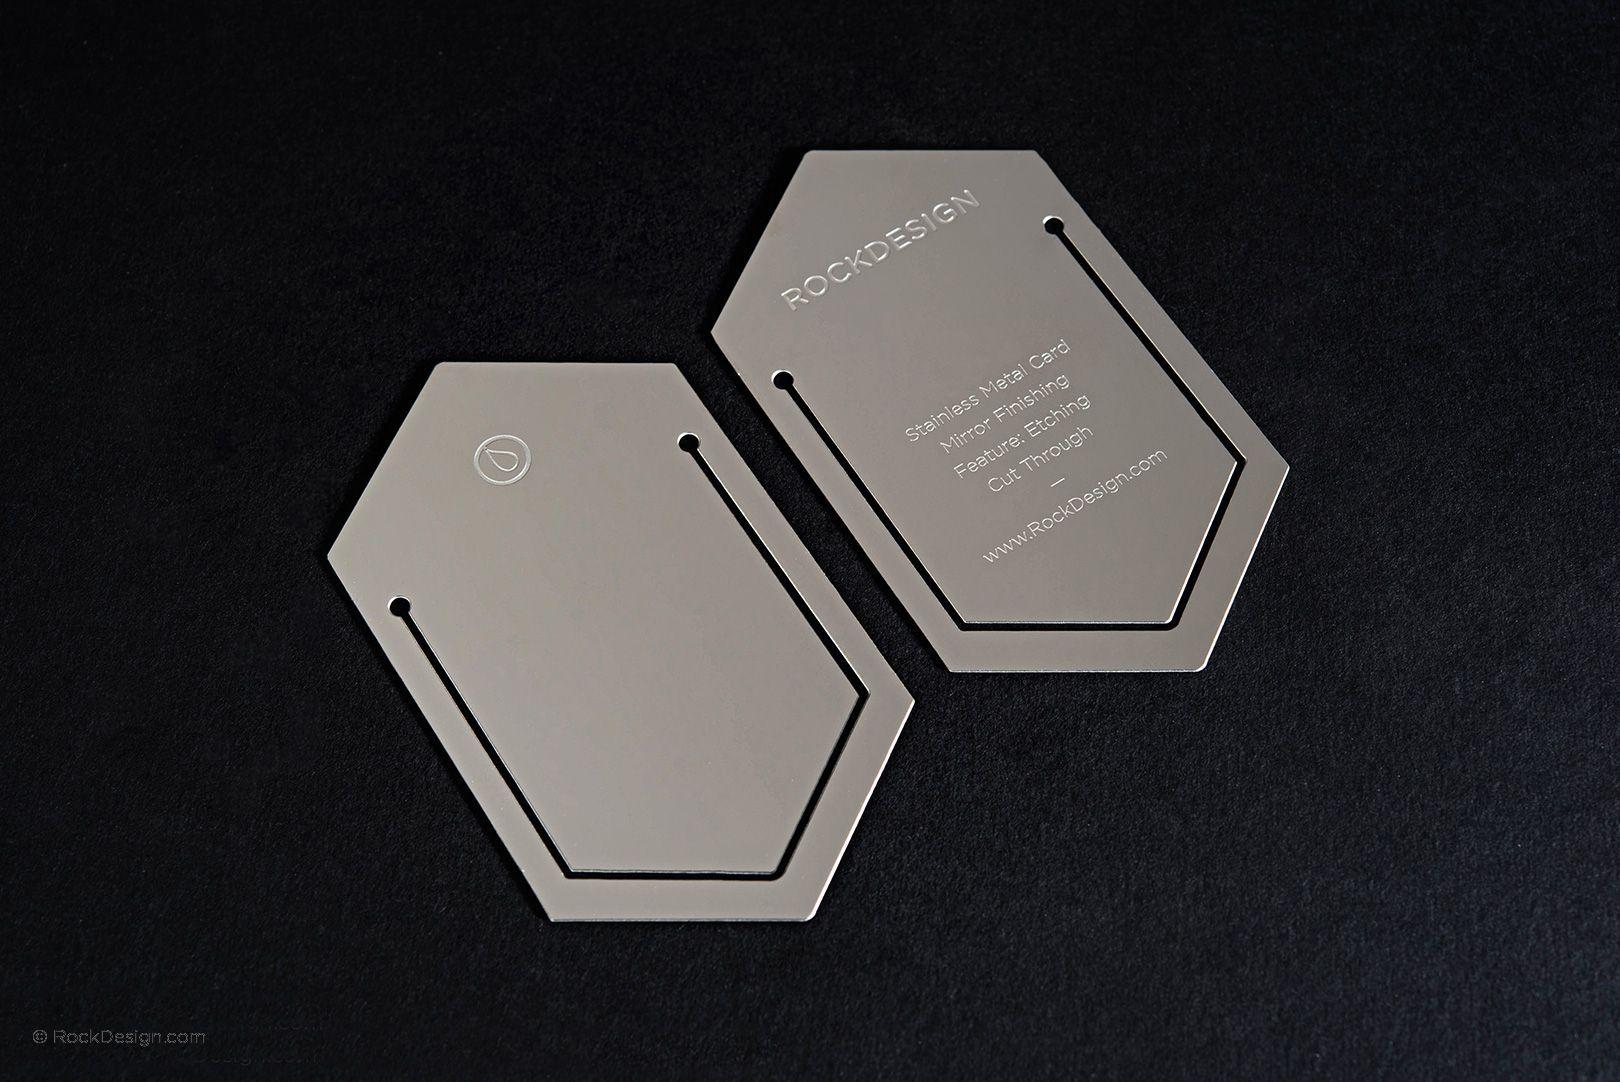 High End Stainless Steel Bookmark Business Card Rock Design Rockdesign Luxury Bu Printing Business Cards Luxury Business Cards Graphic Design Business Card